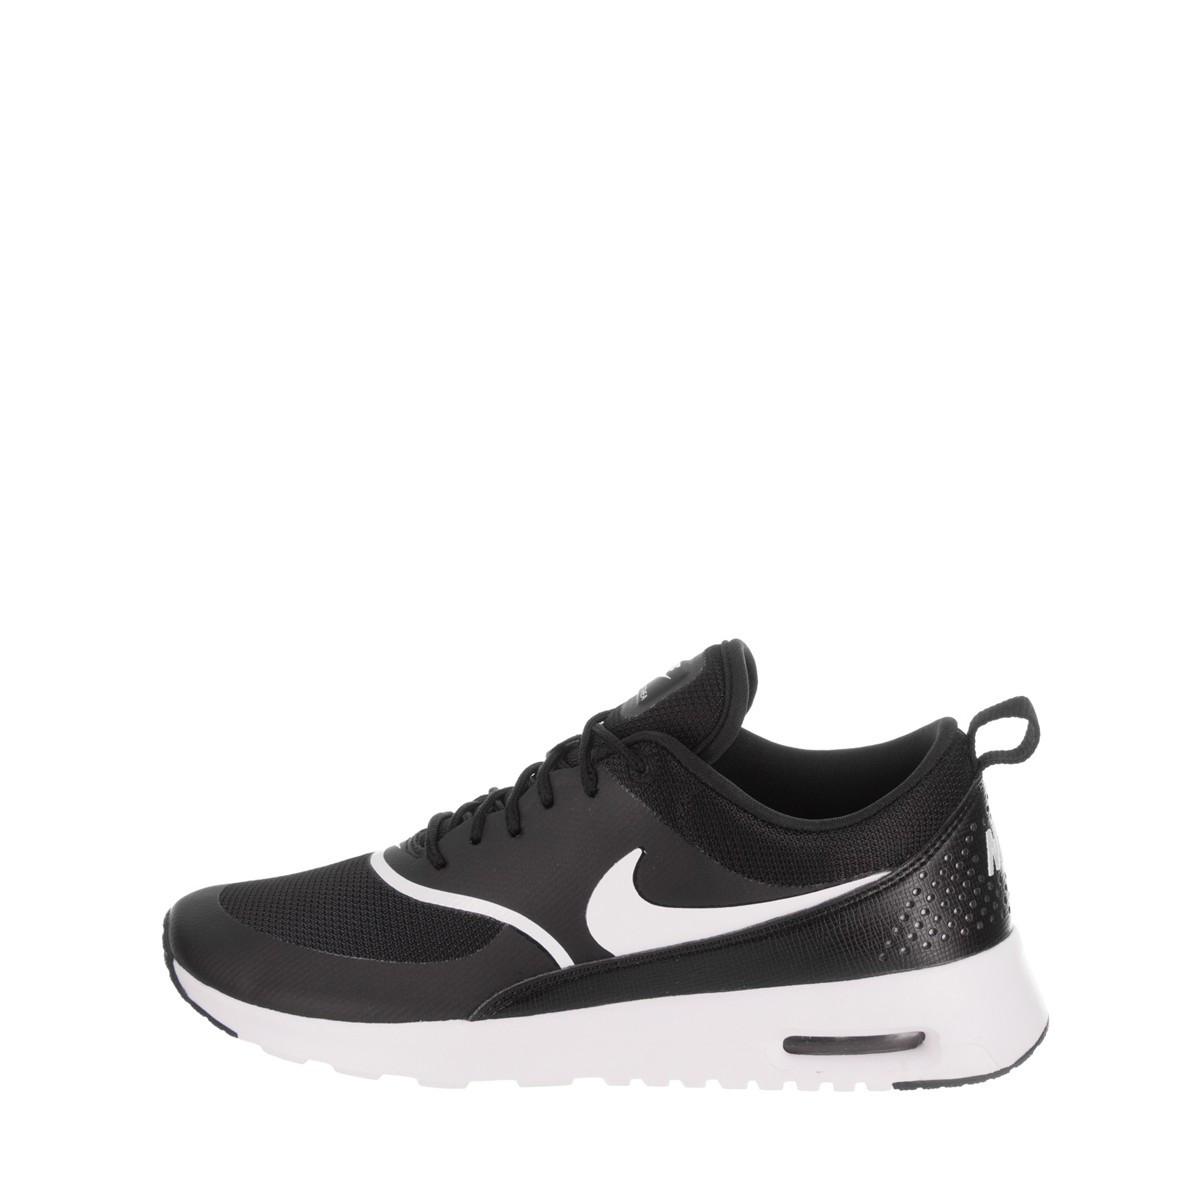 pretty nice 62156 43ea7 Nike Basket Nike W AIR MAX THEA - 599409-028. Loading zoom